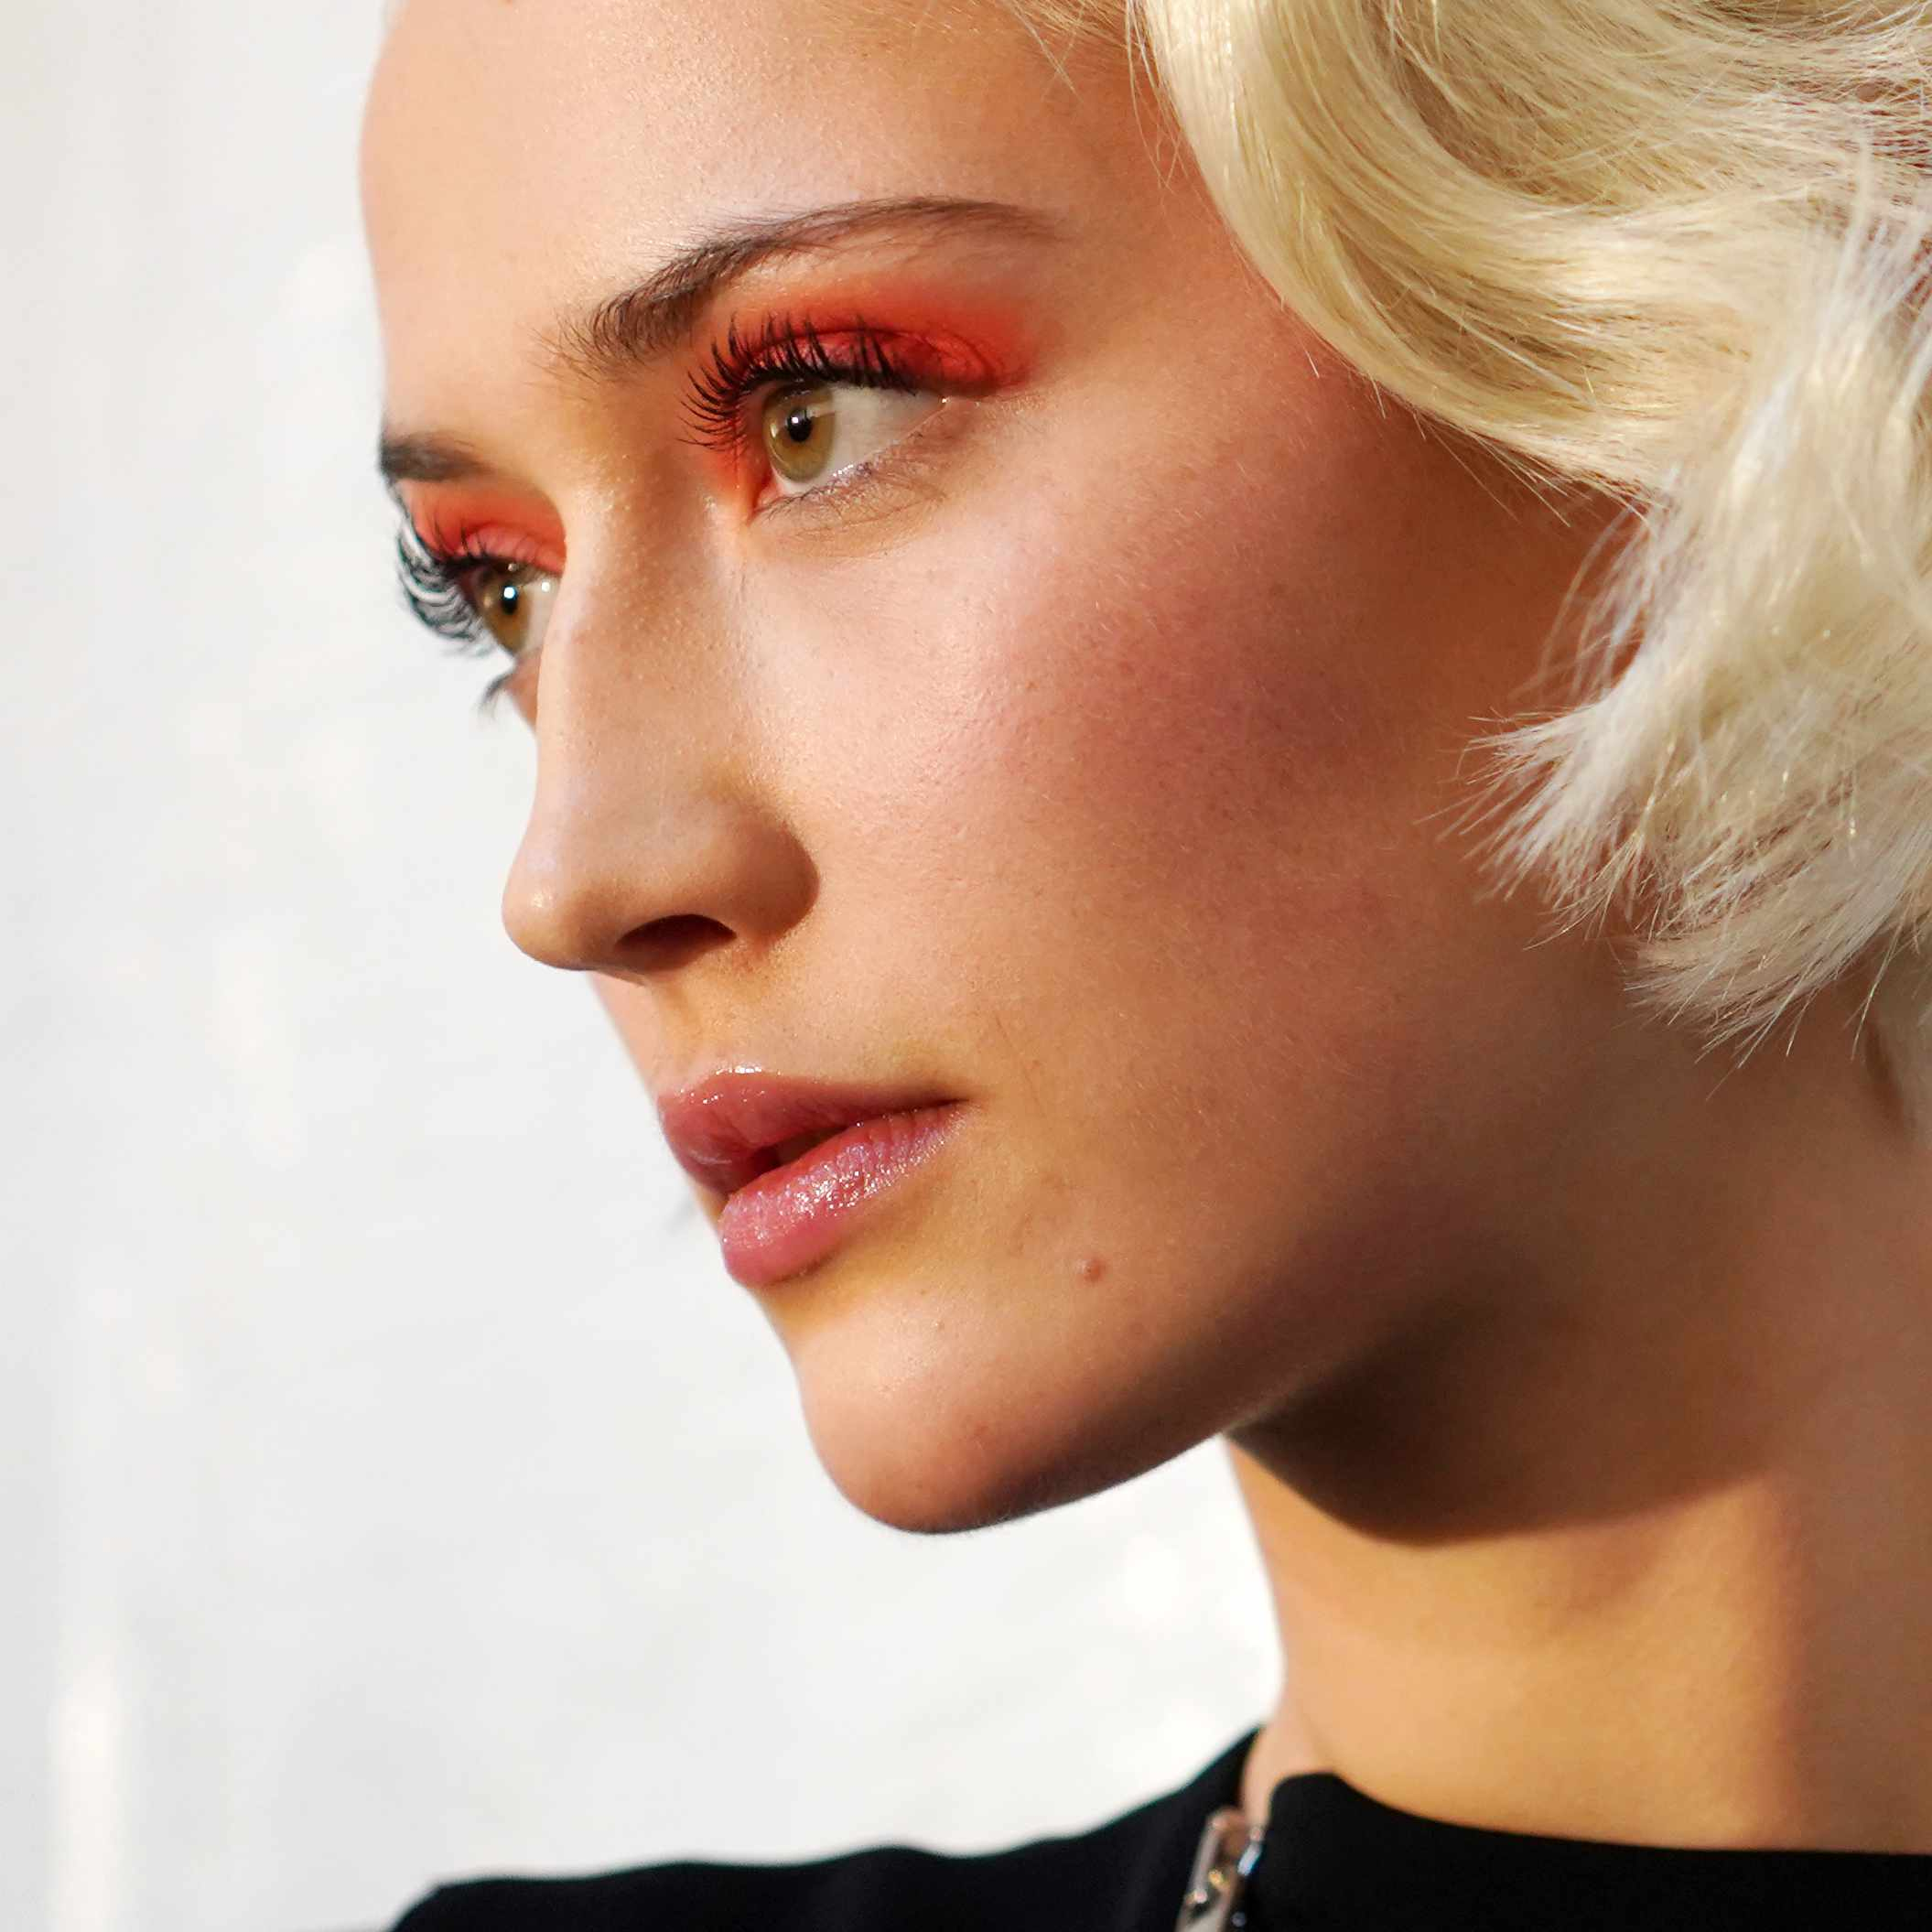 blonde woman with orange eyeshadow